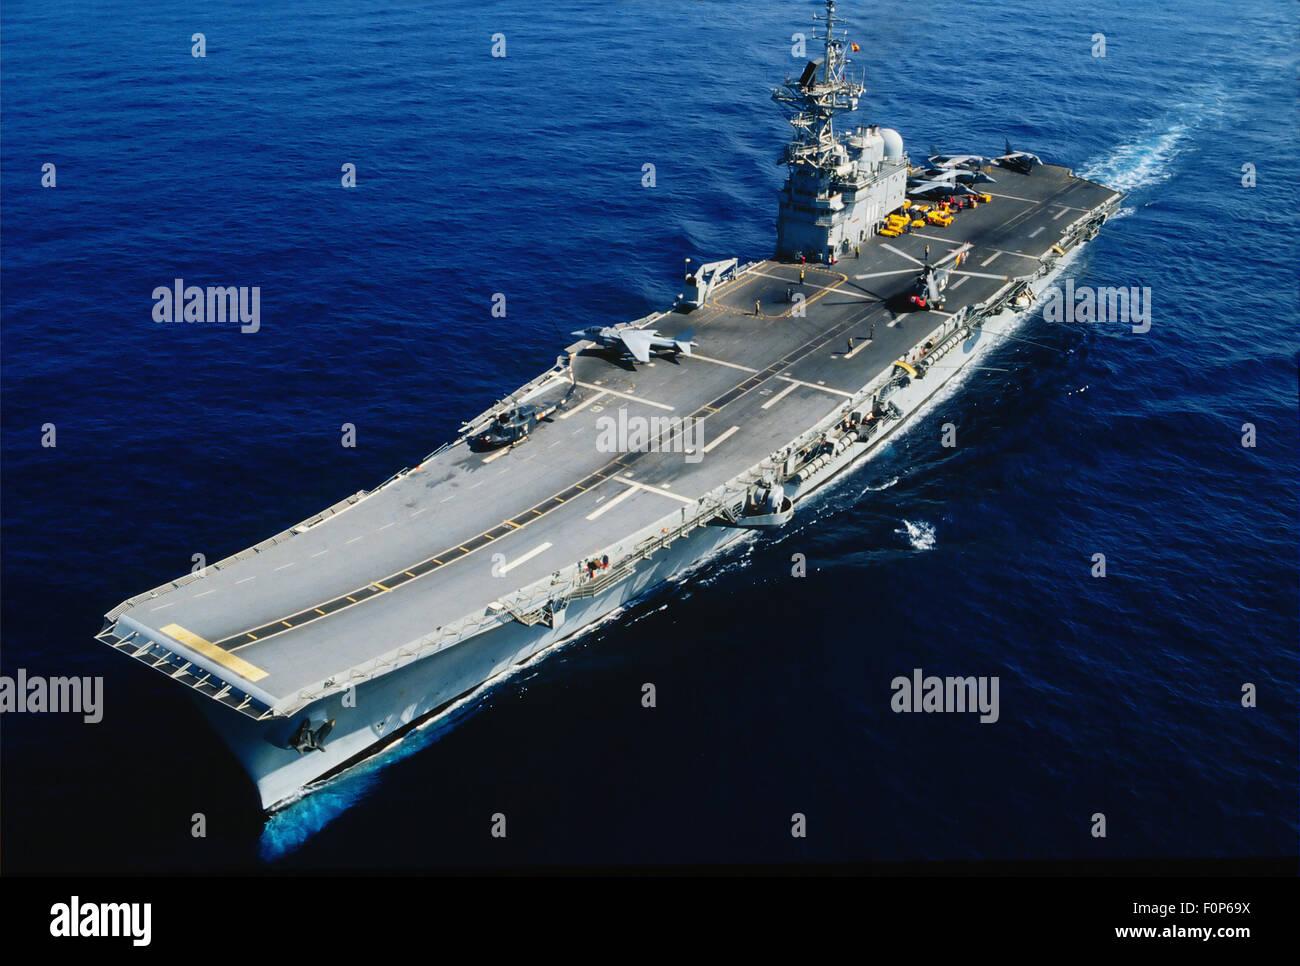 Spanish Navy, Principe de Asturias aircraft carrier Stock ...Spanish Aircraft Carrier Principe De Asturias